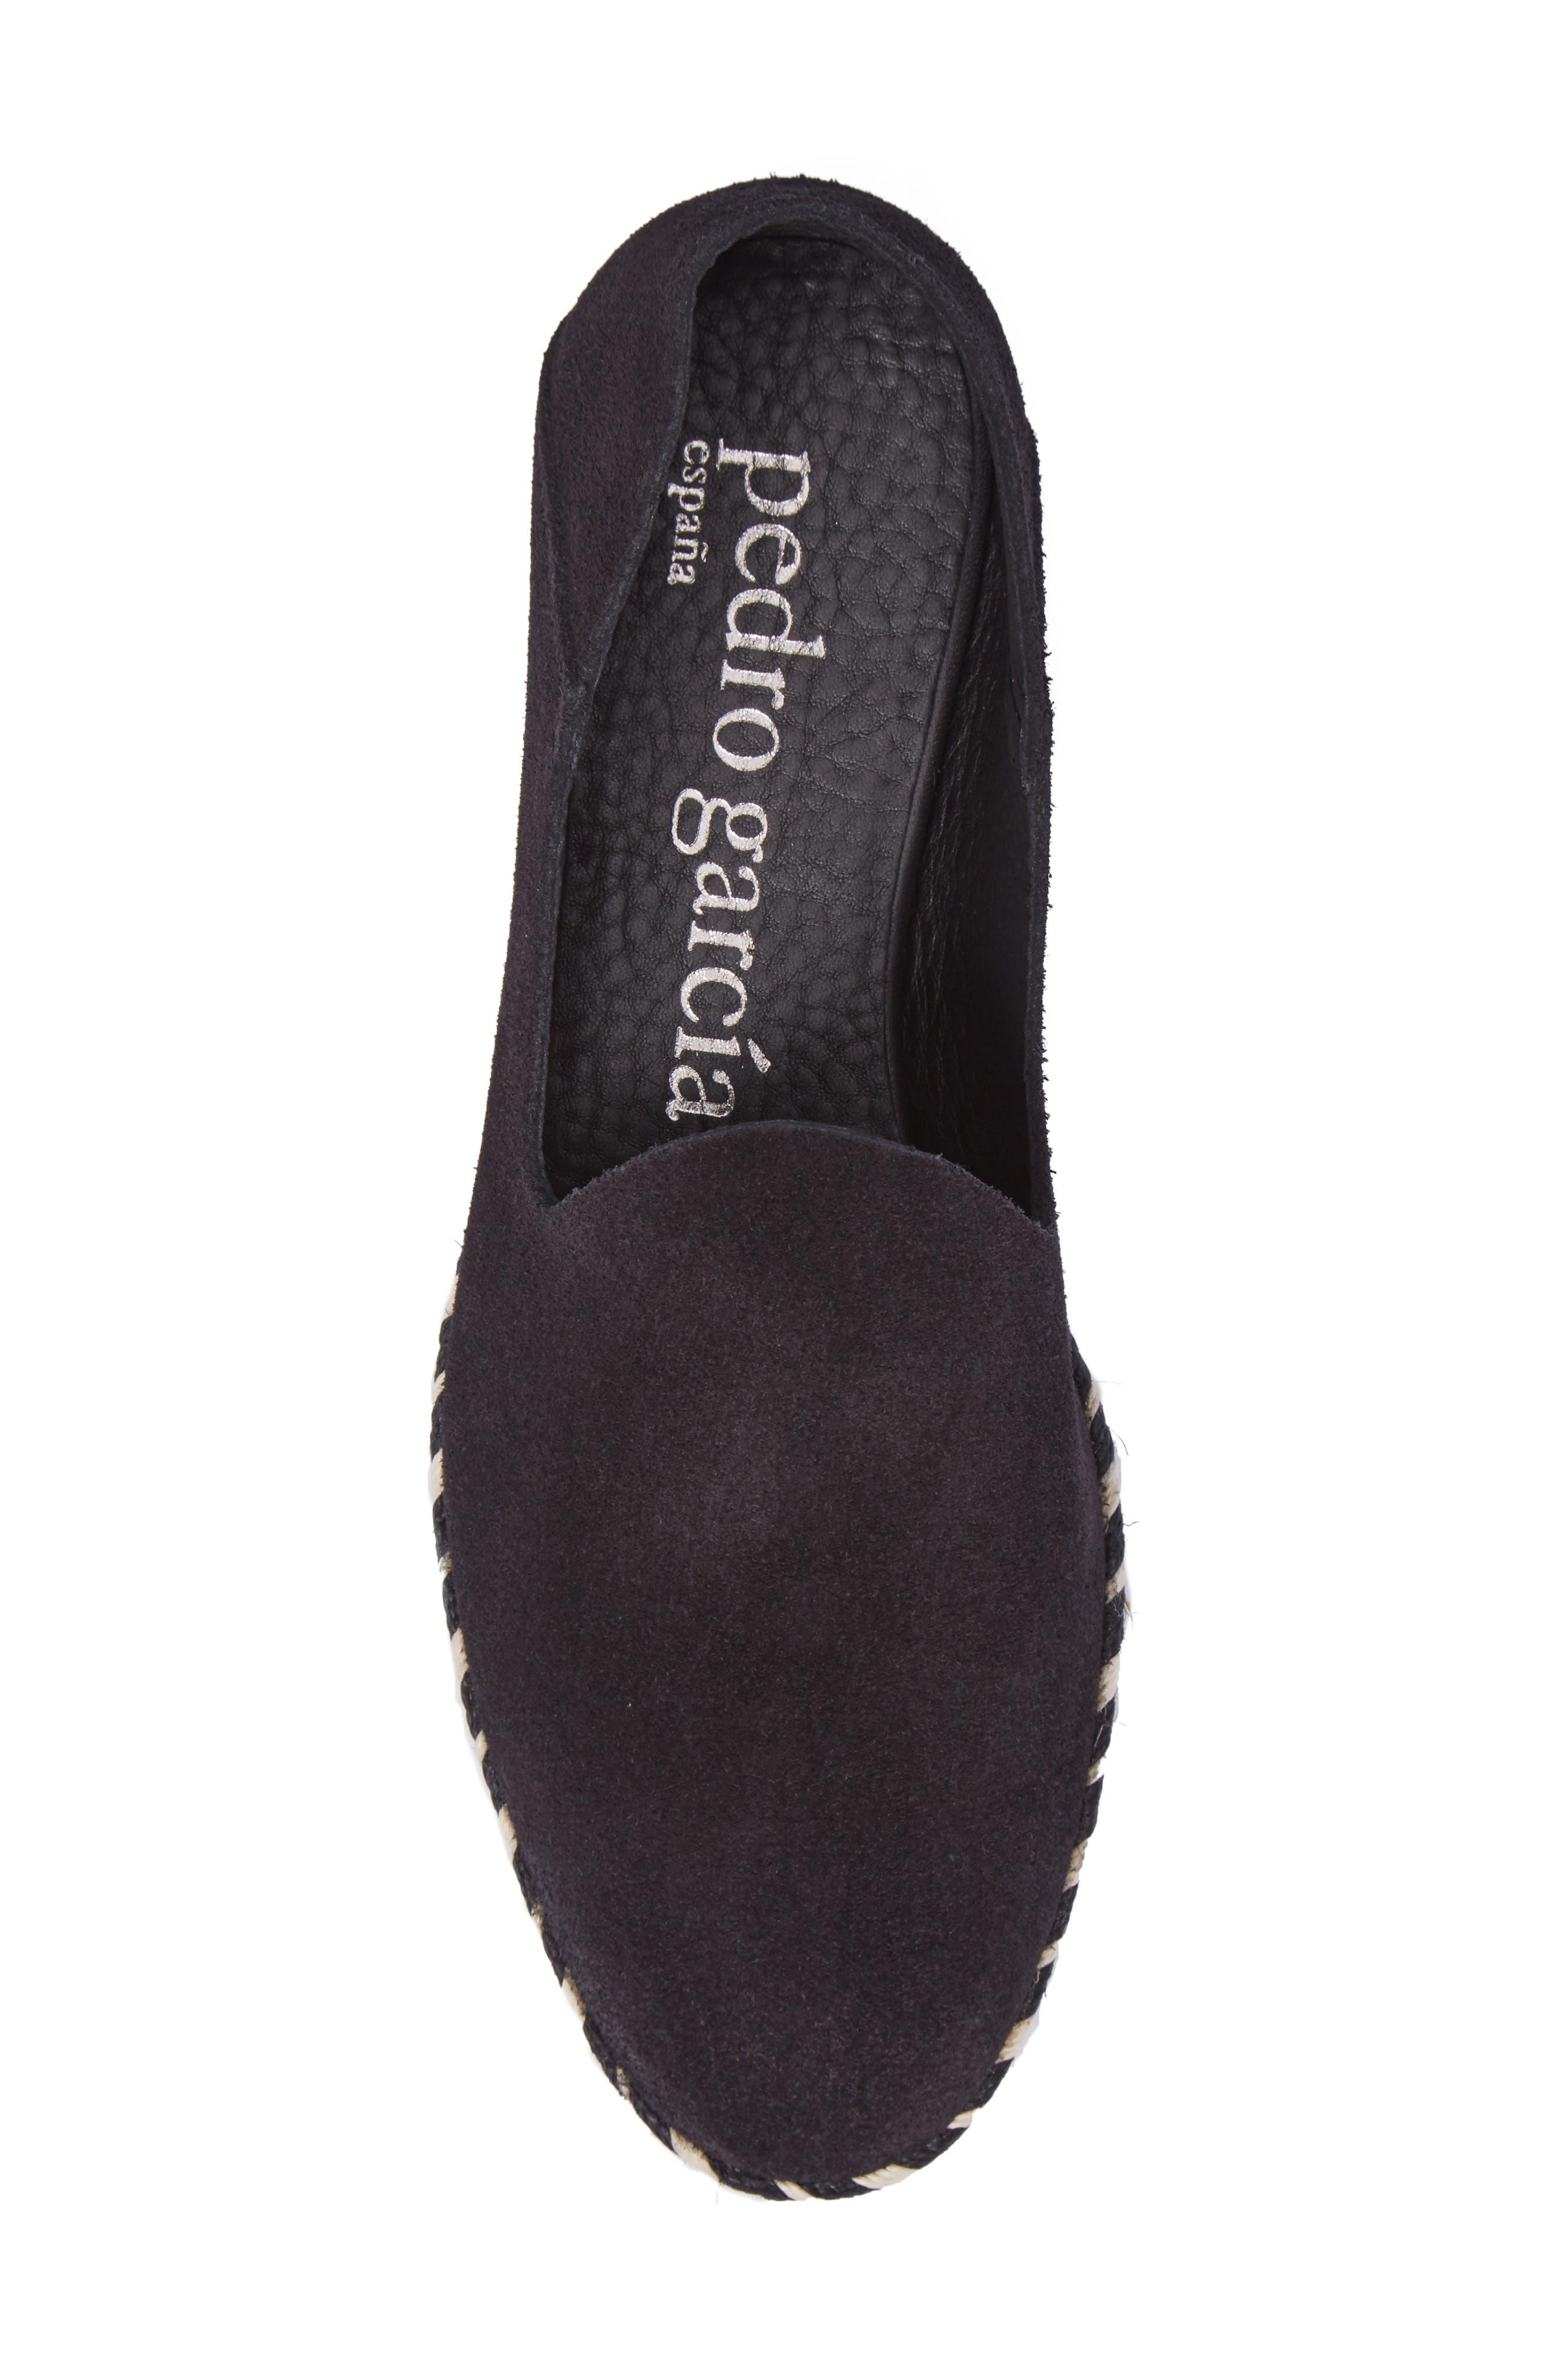 Yuli Convertible Woven Loafer,                             Alternate thumbnail 6, color,                             BLACK